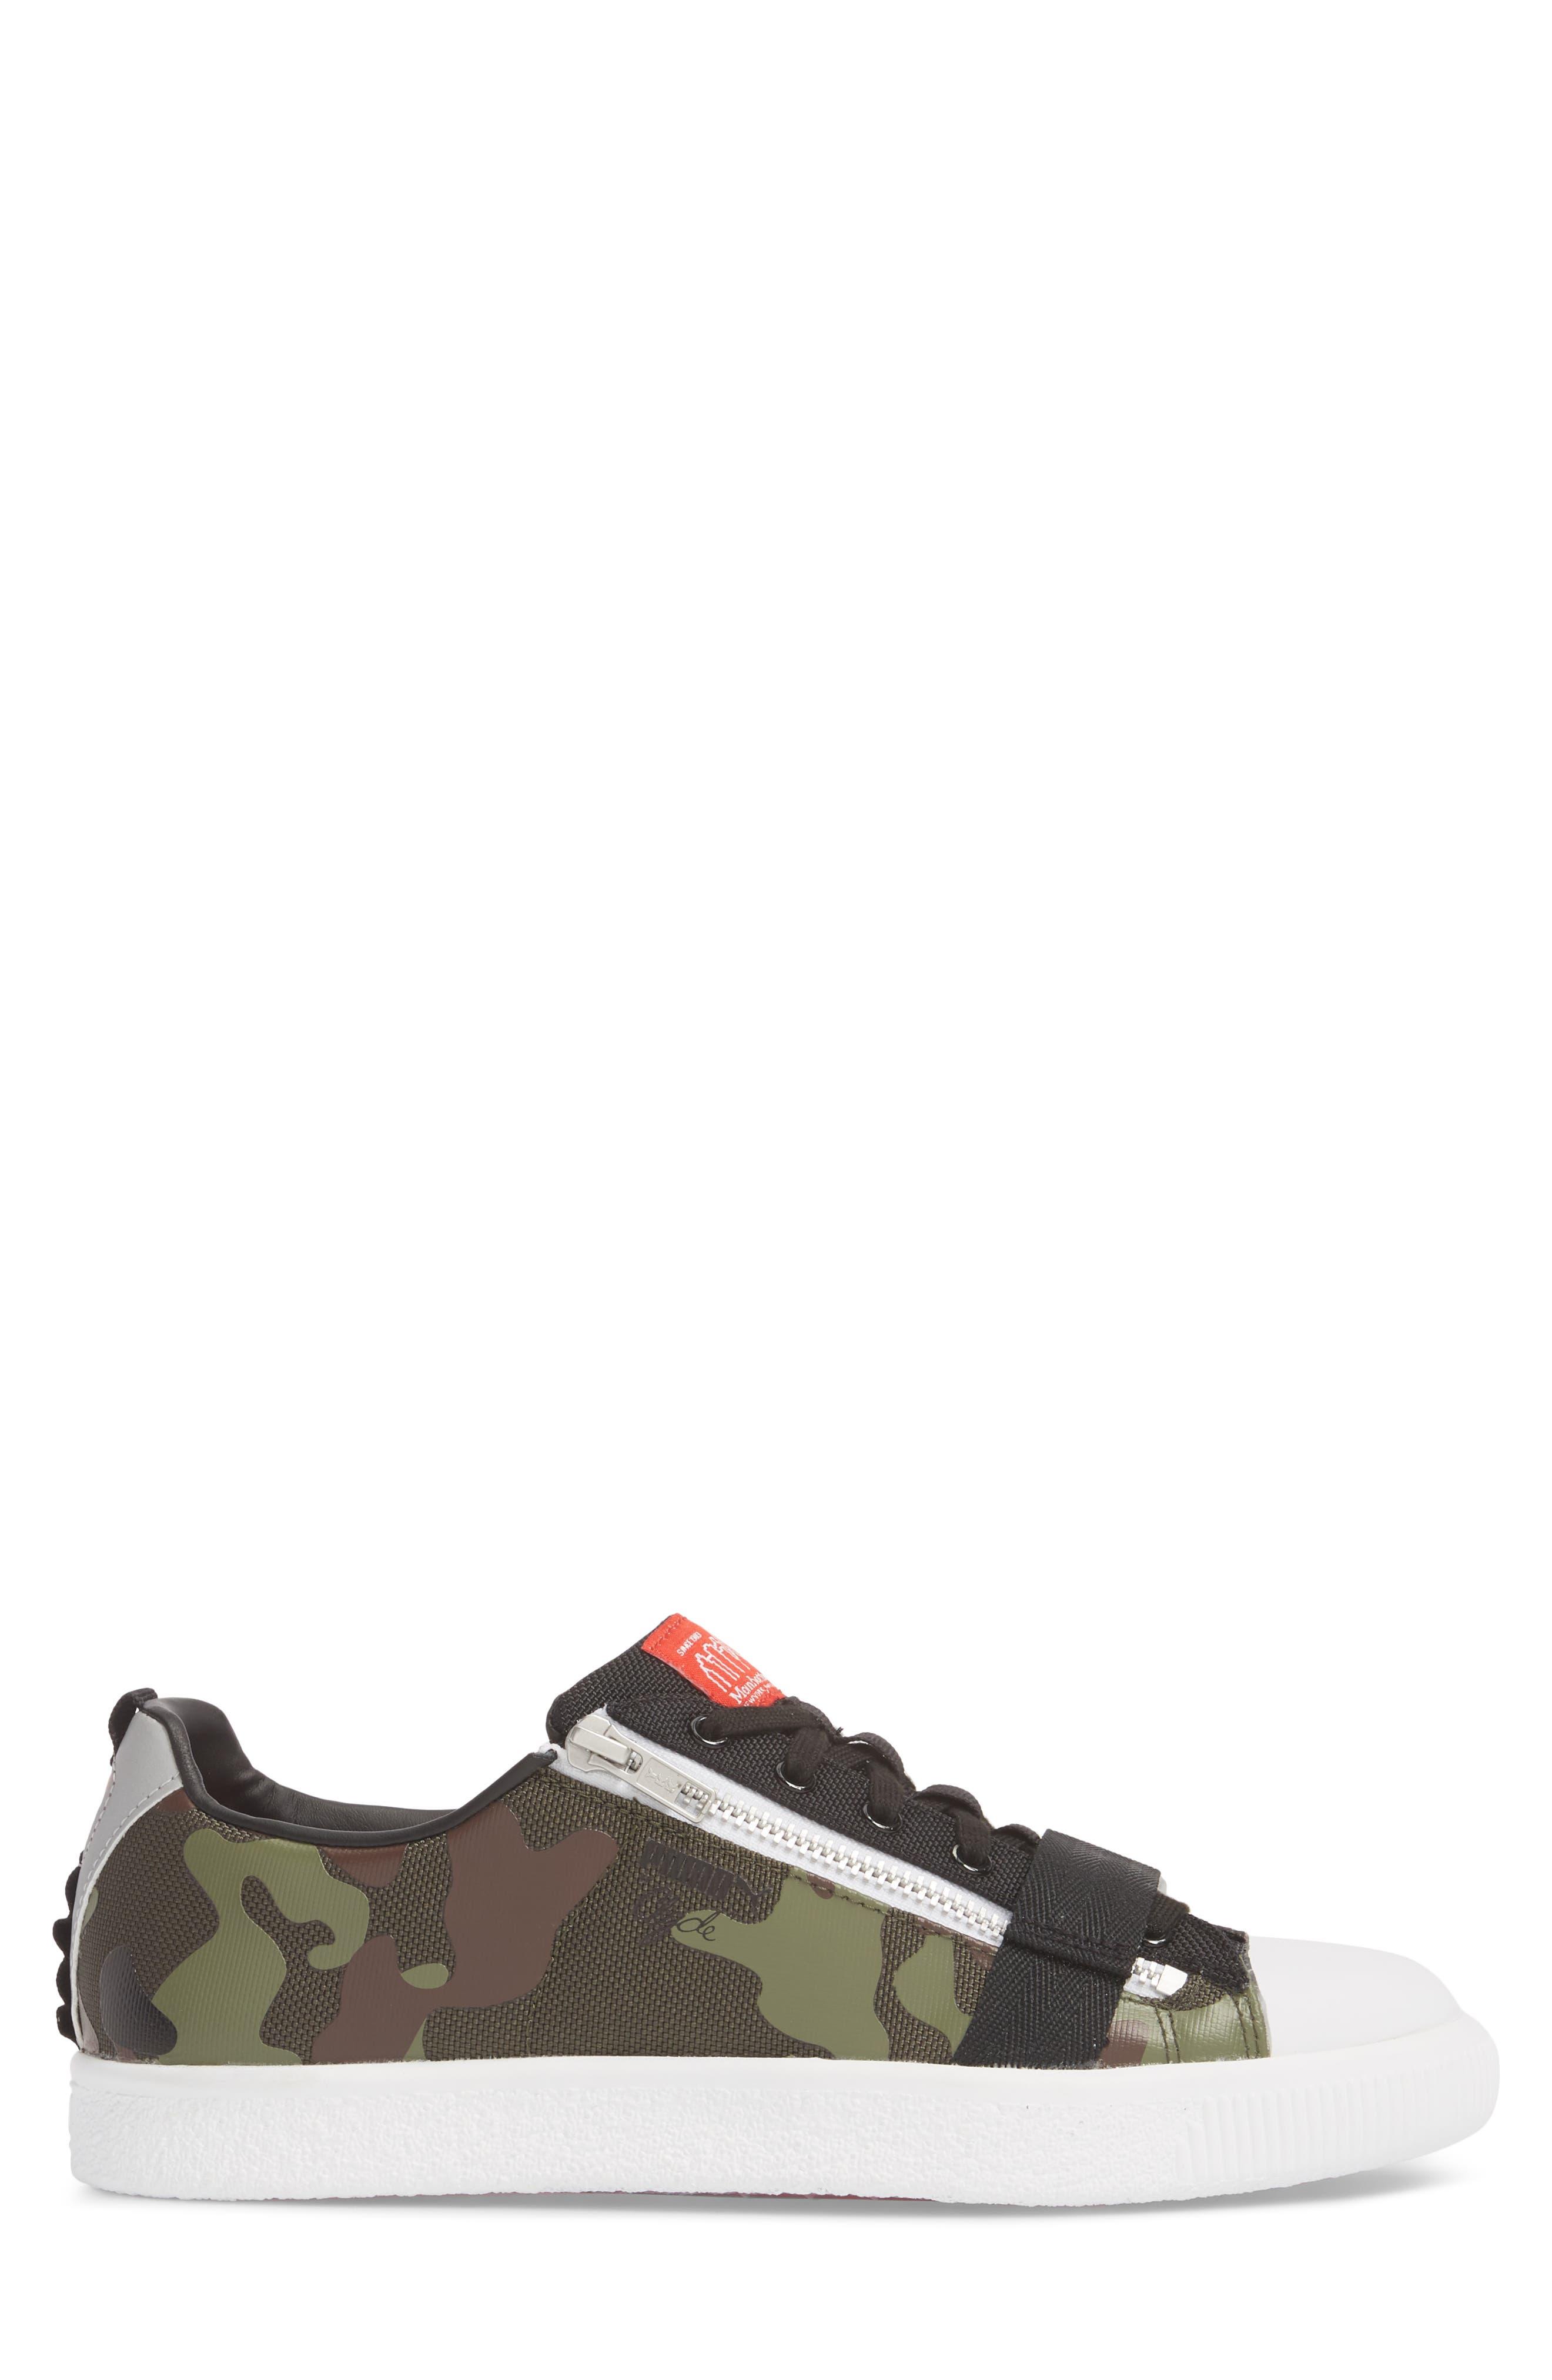 x MANHATTAN PORTAGE Clyde Zip Sneaker,                             Alternate thumbnail 3, color,                             300